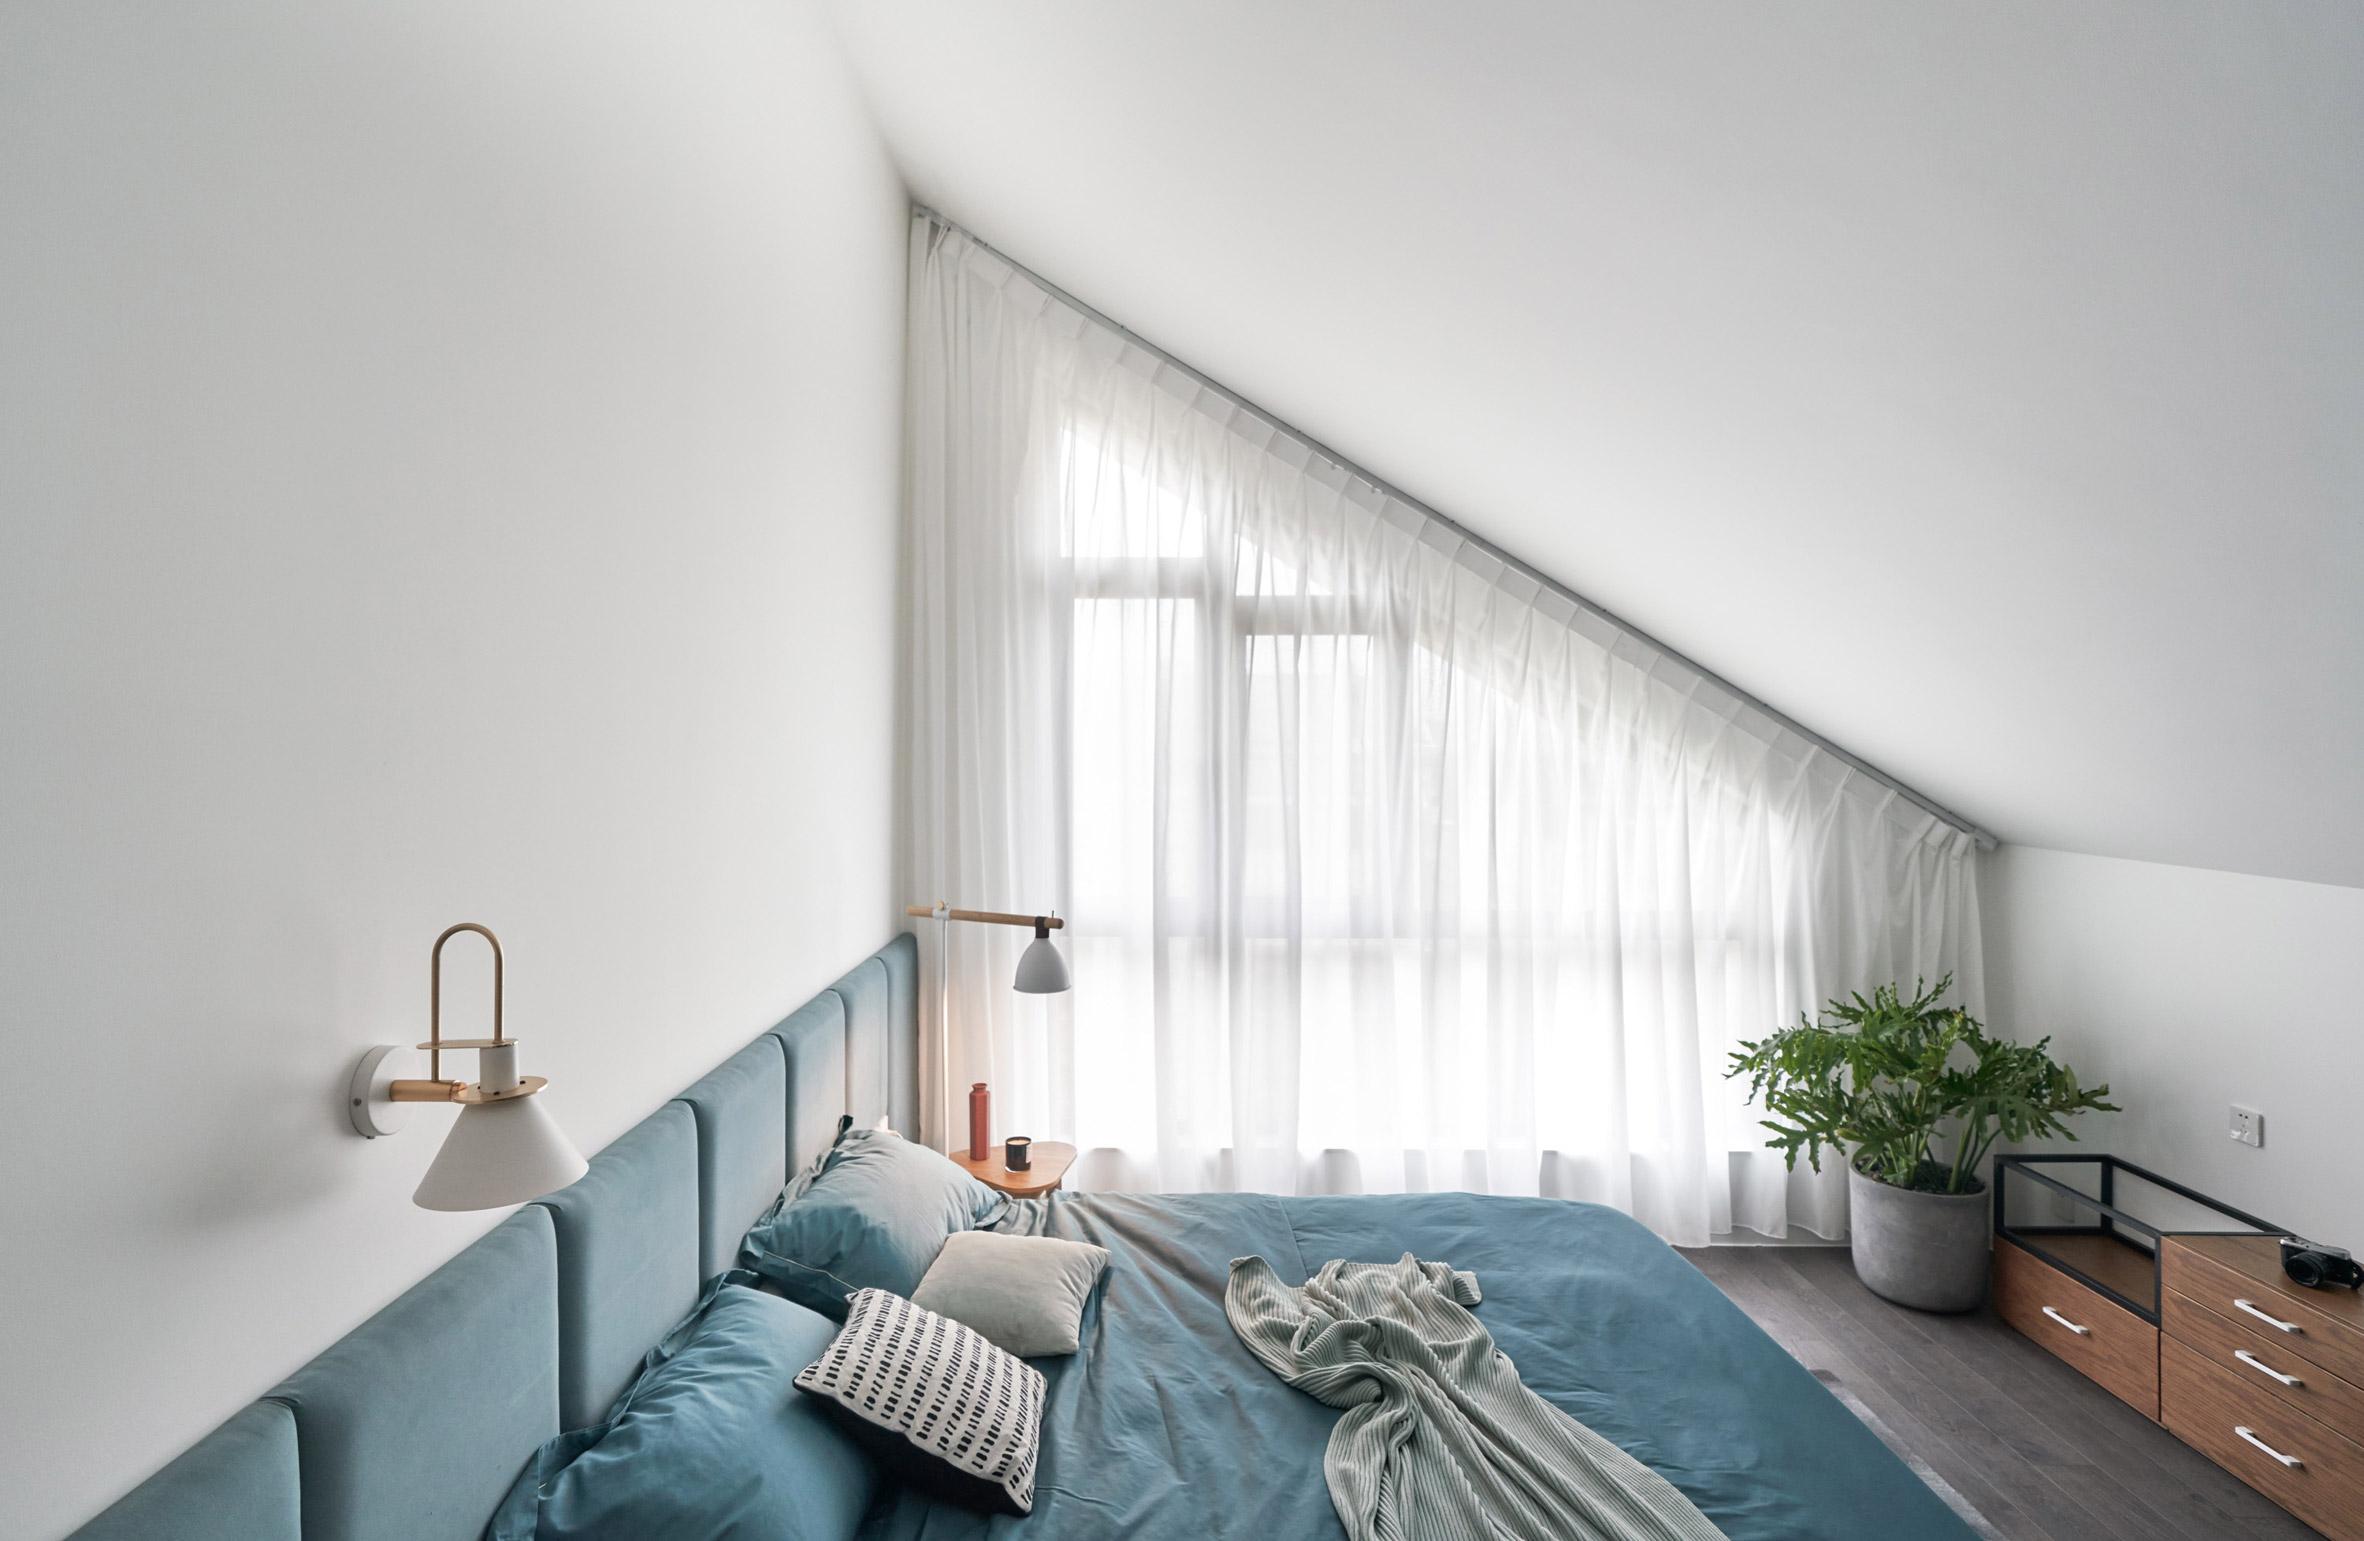 căn hộ cho gia đình trẻ starburst-house-hao-design-interiors-residential-china-beijing-elledecoration vietnam 1